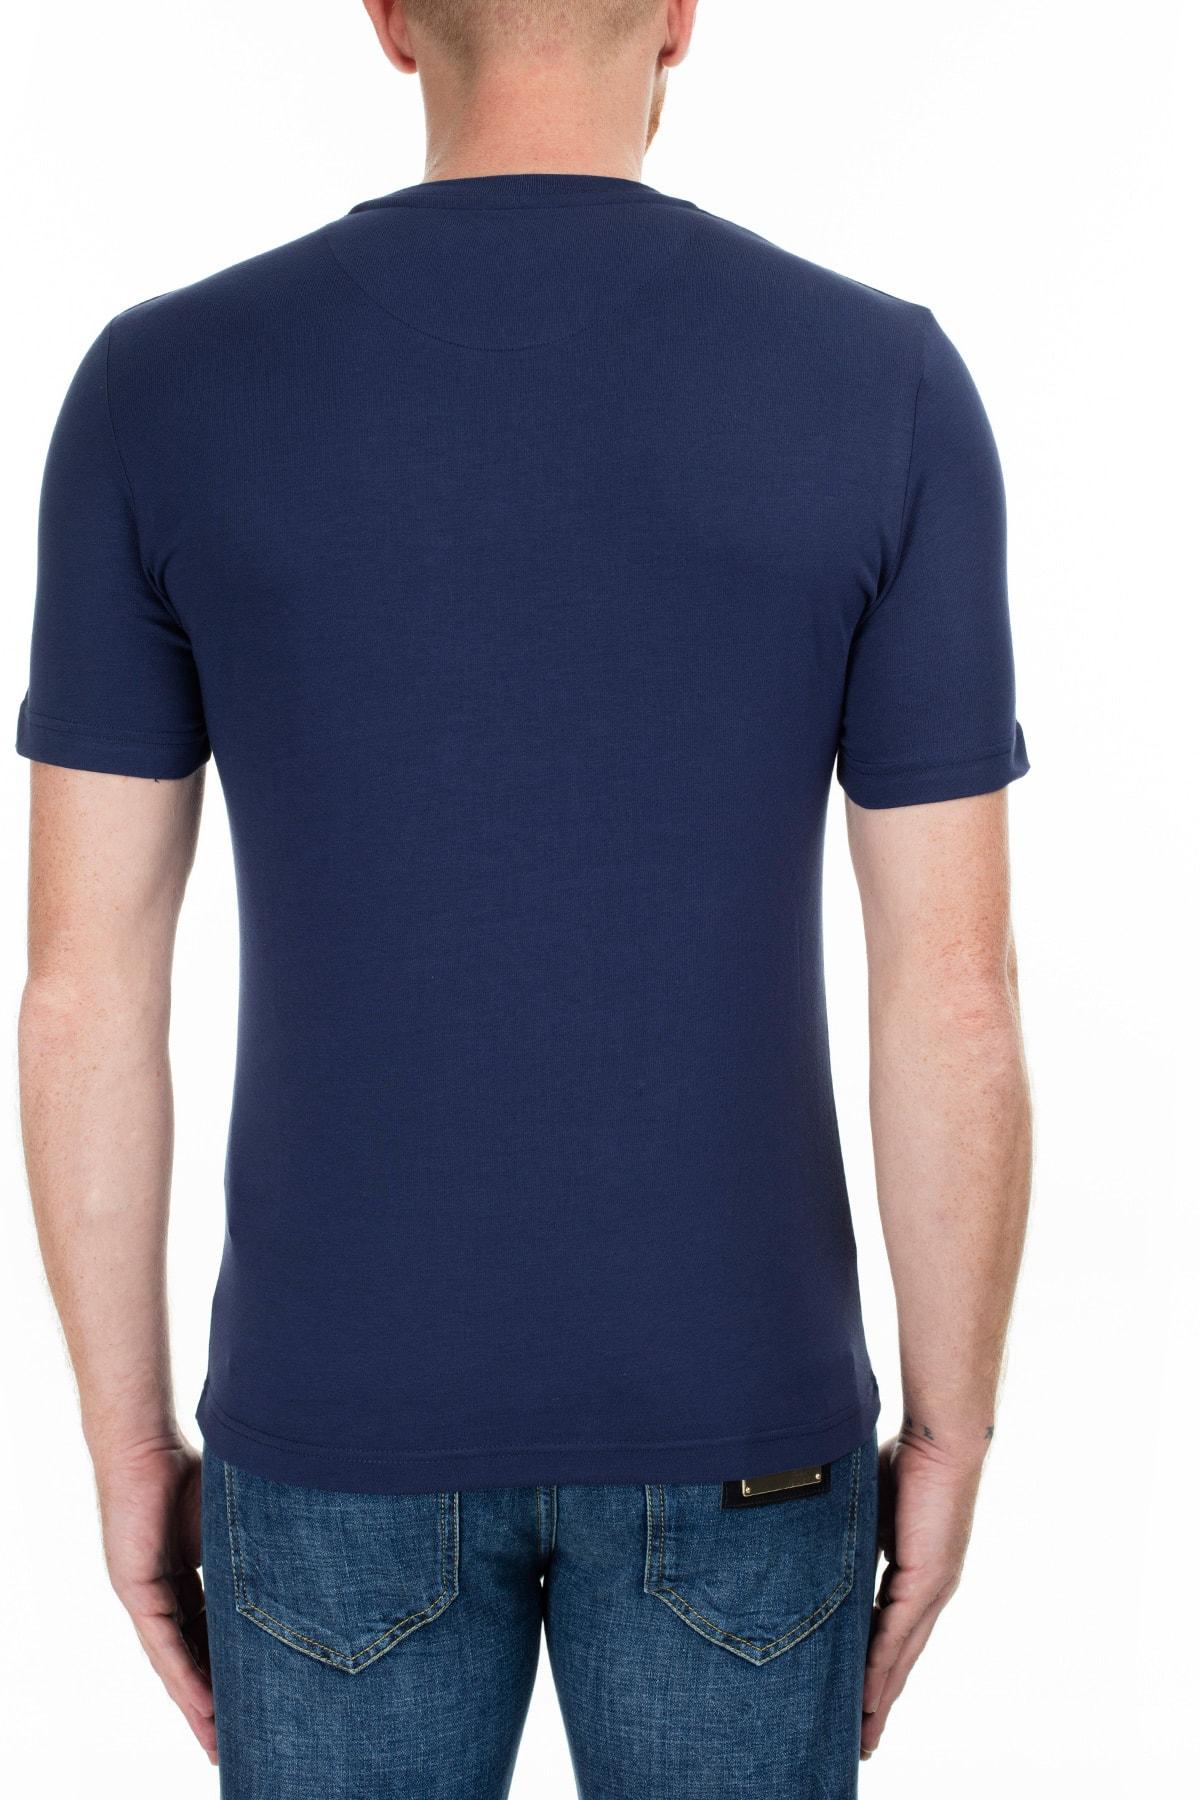 Love Moschino Erkek Lacivert T-Shirt S M47312Ie1811 Y61 2